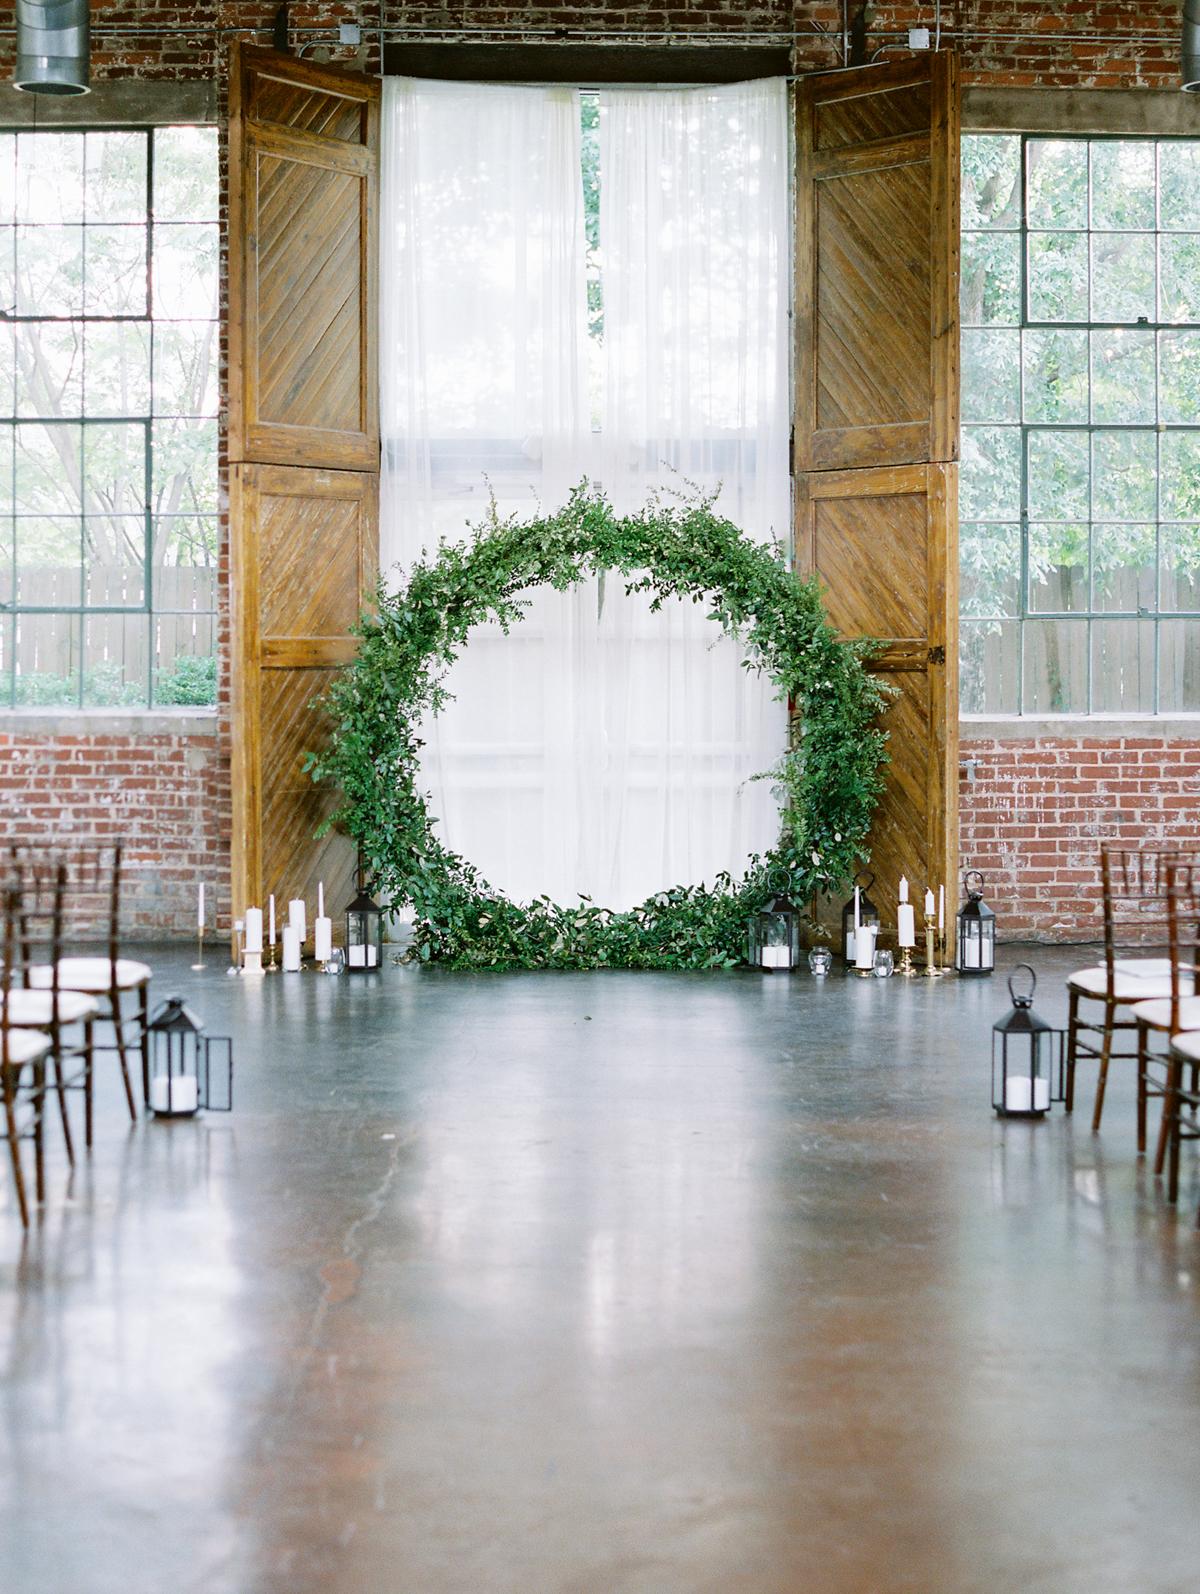 Foundry-At-Puritan-Mill-wedding-photos-venue-atlanta-fine-art-film-photographer29.JPG